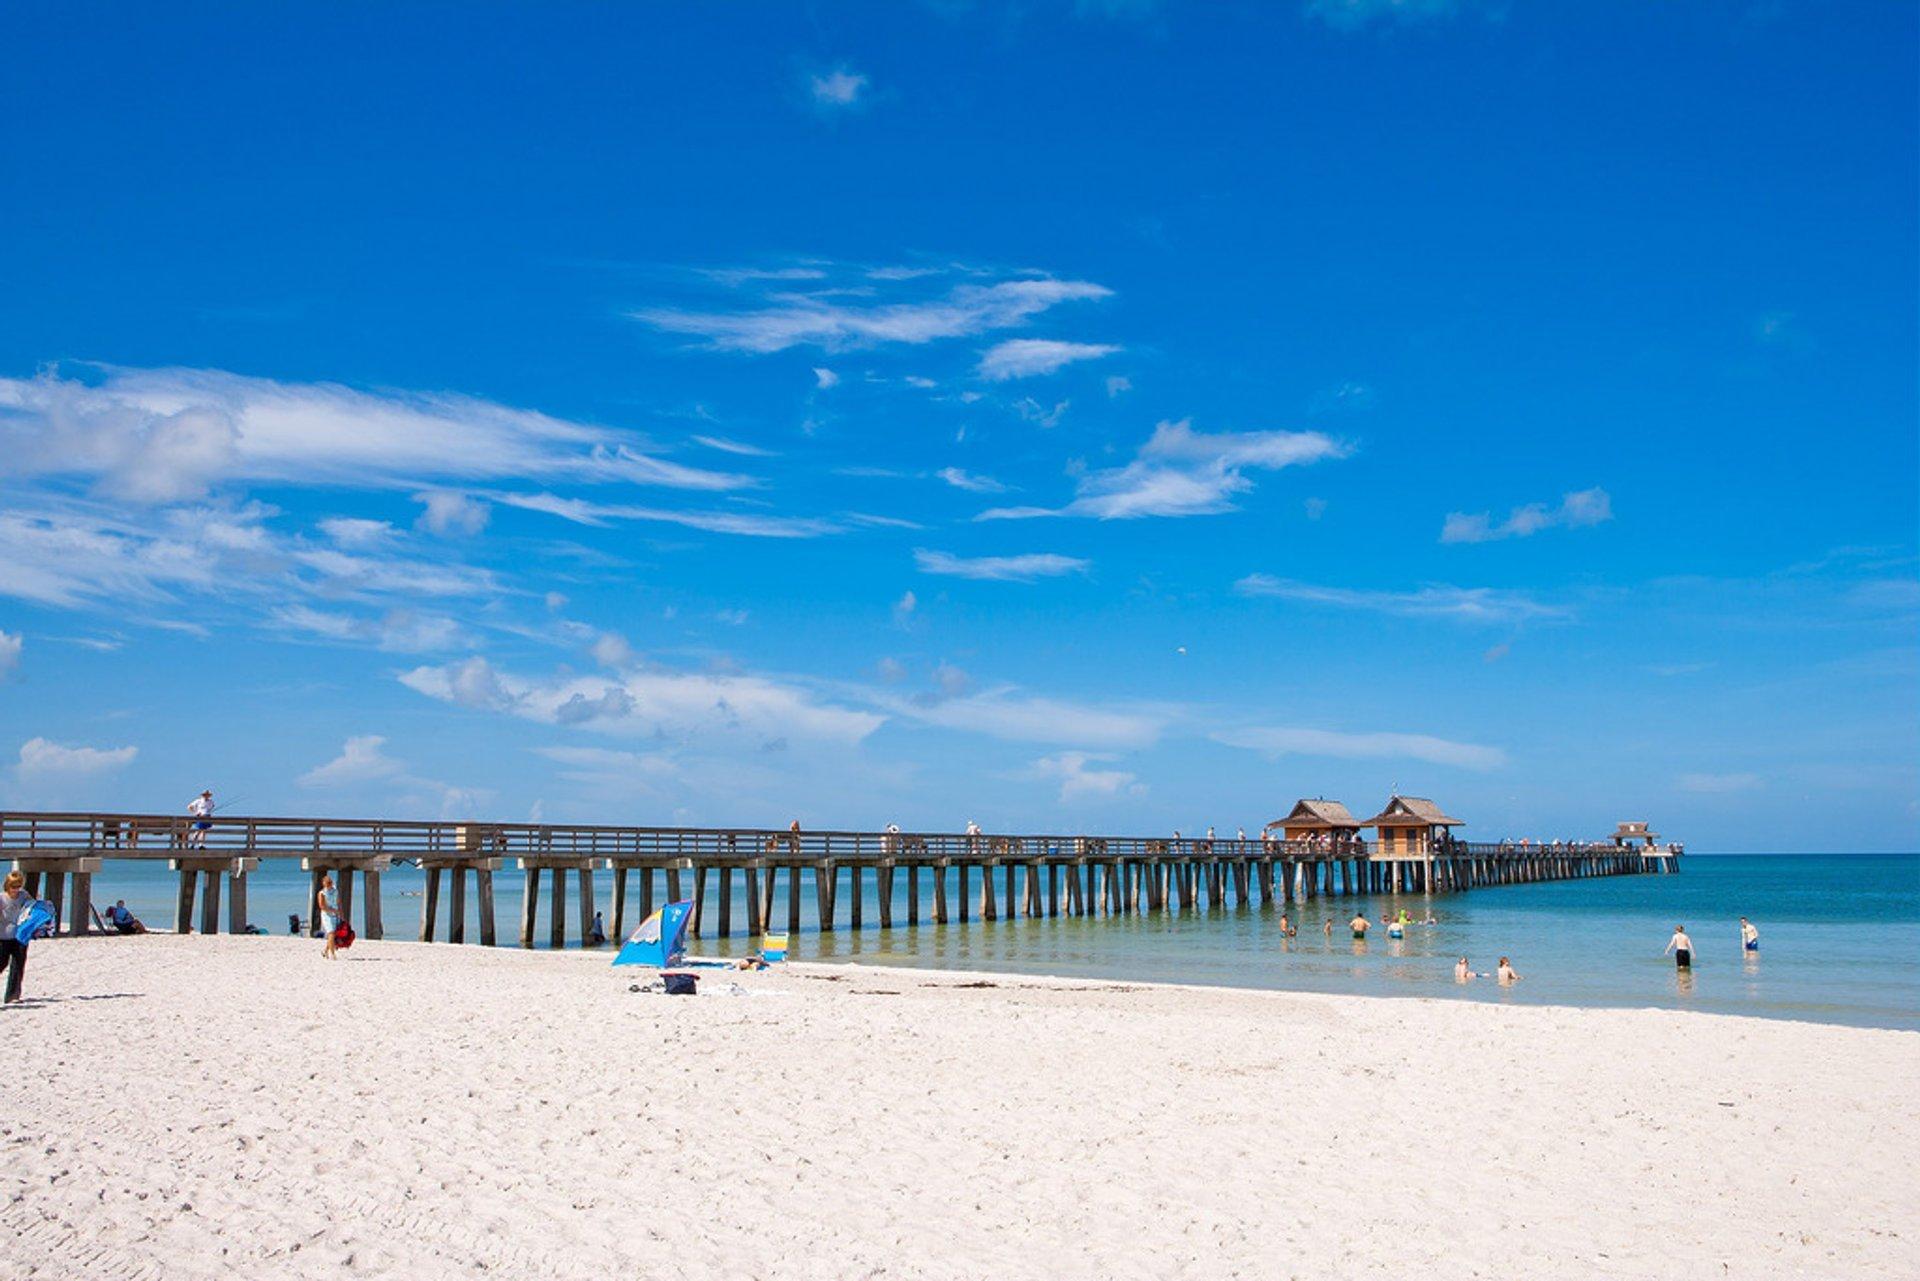 Naples Pier, Naples, Florida 2019